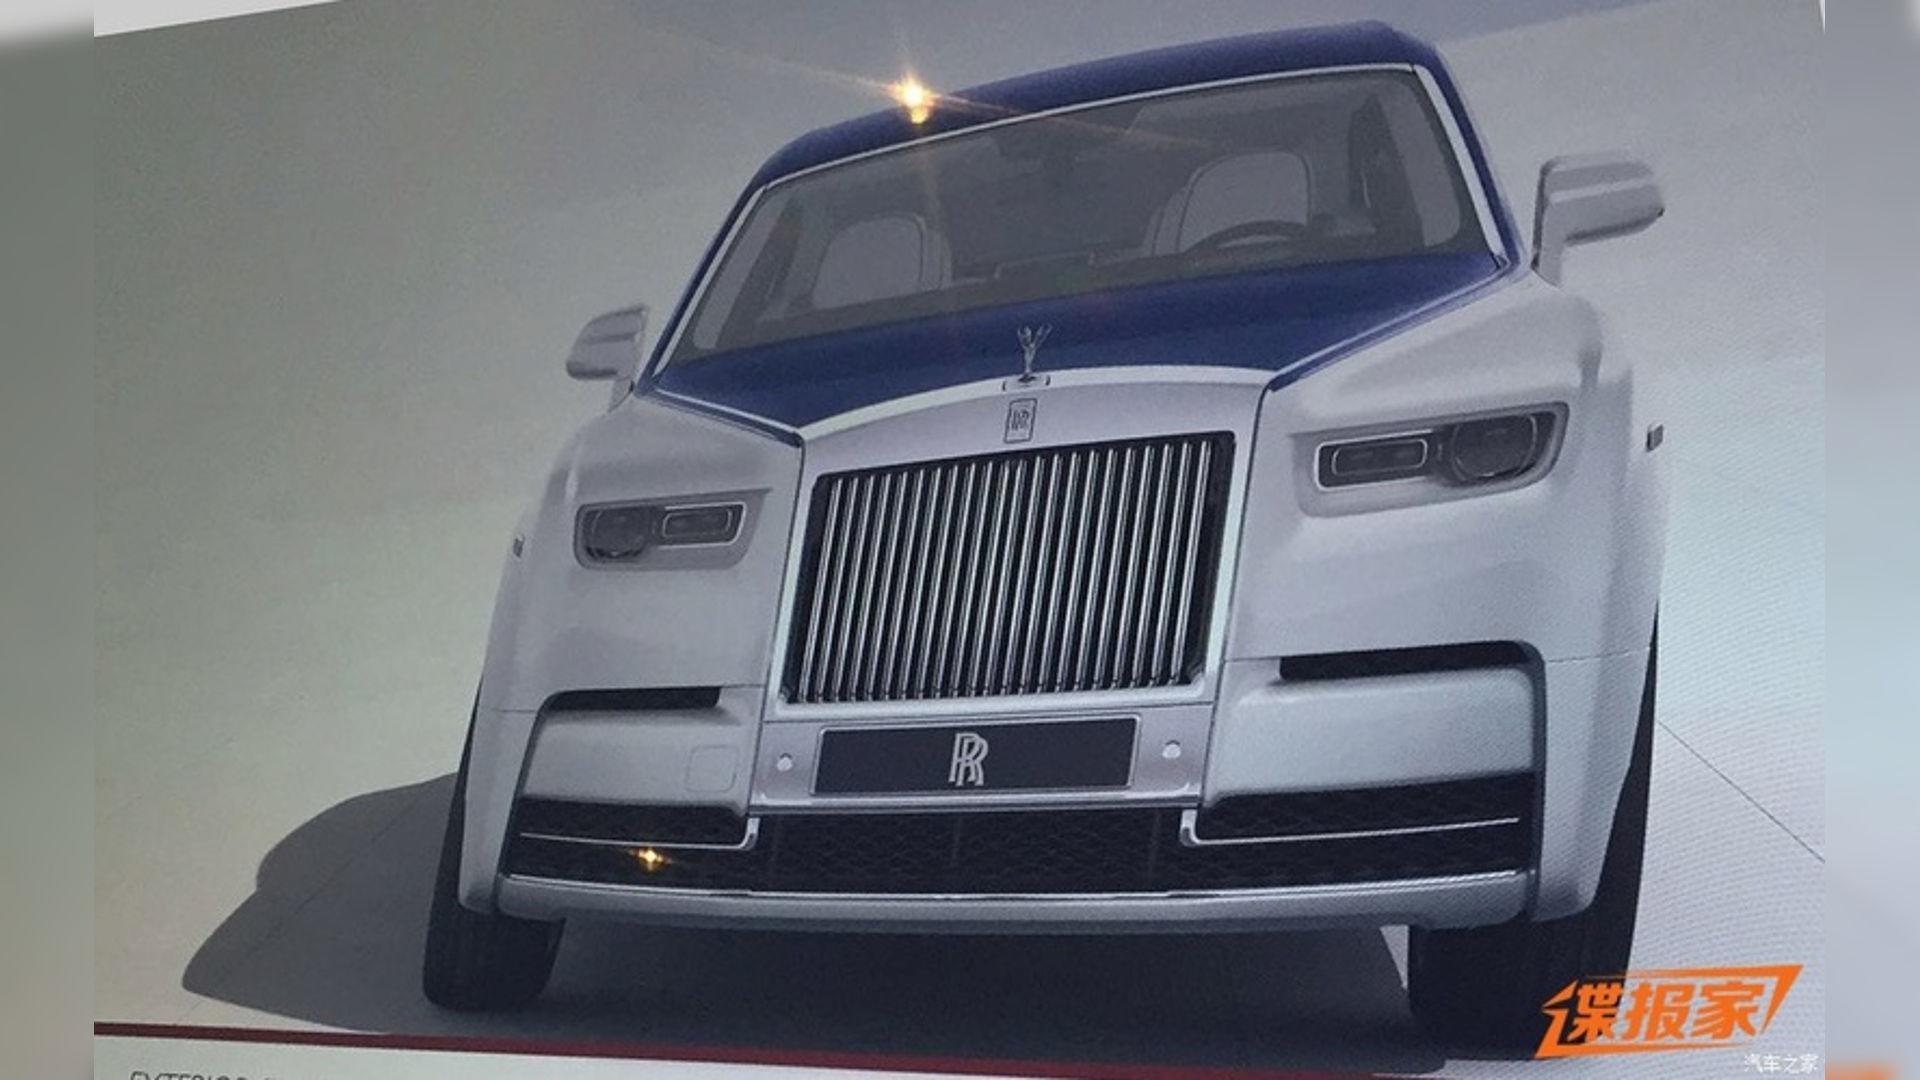 Photo of Πρώτη γεύση από τη νέα Rolls-Royce Phantom